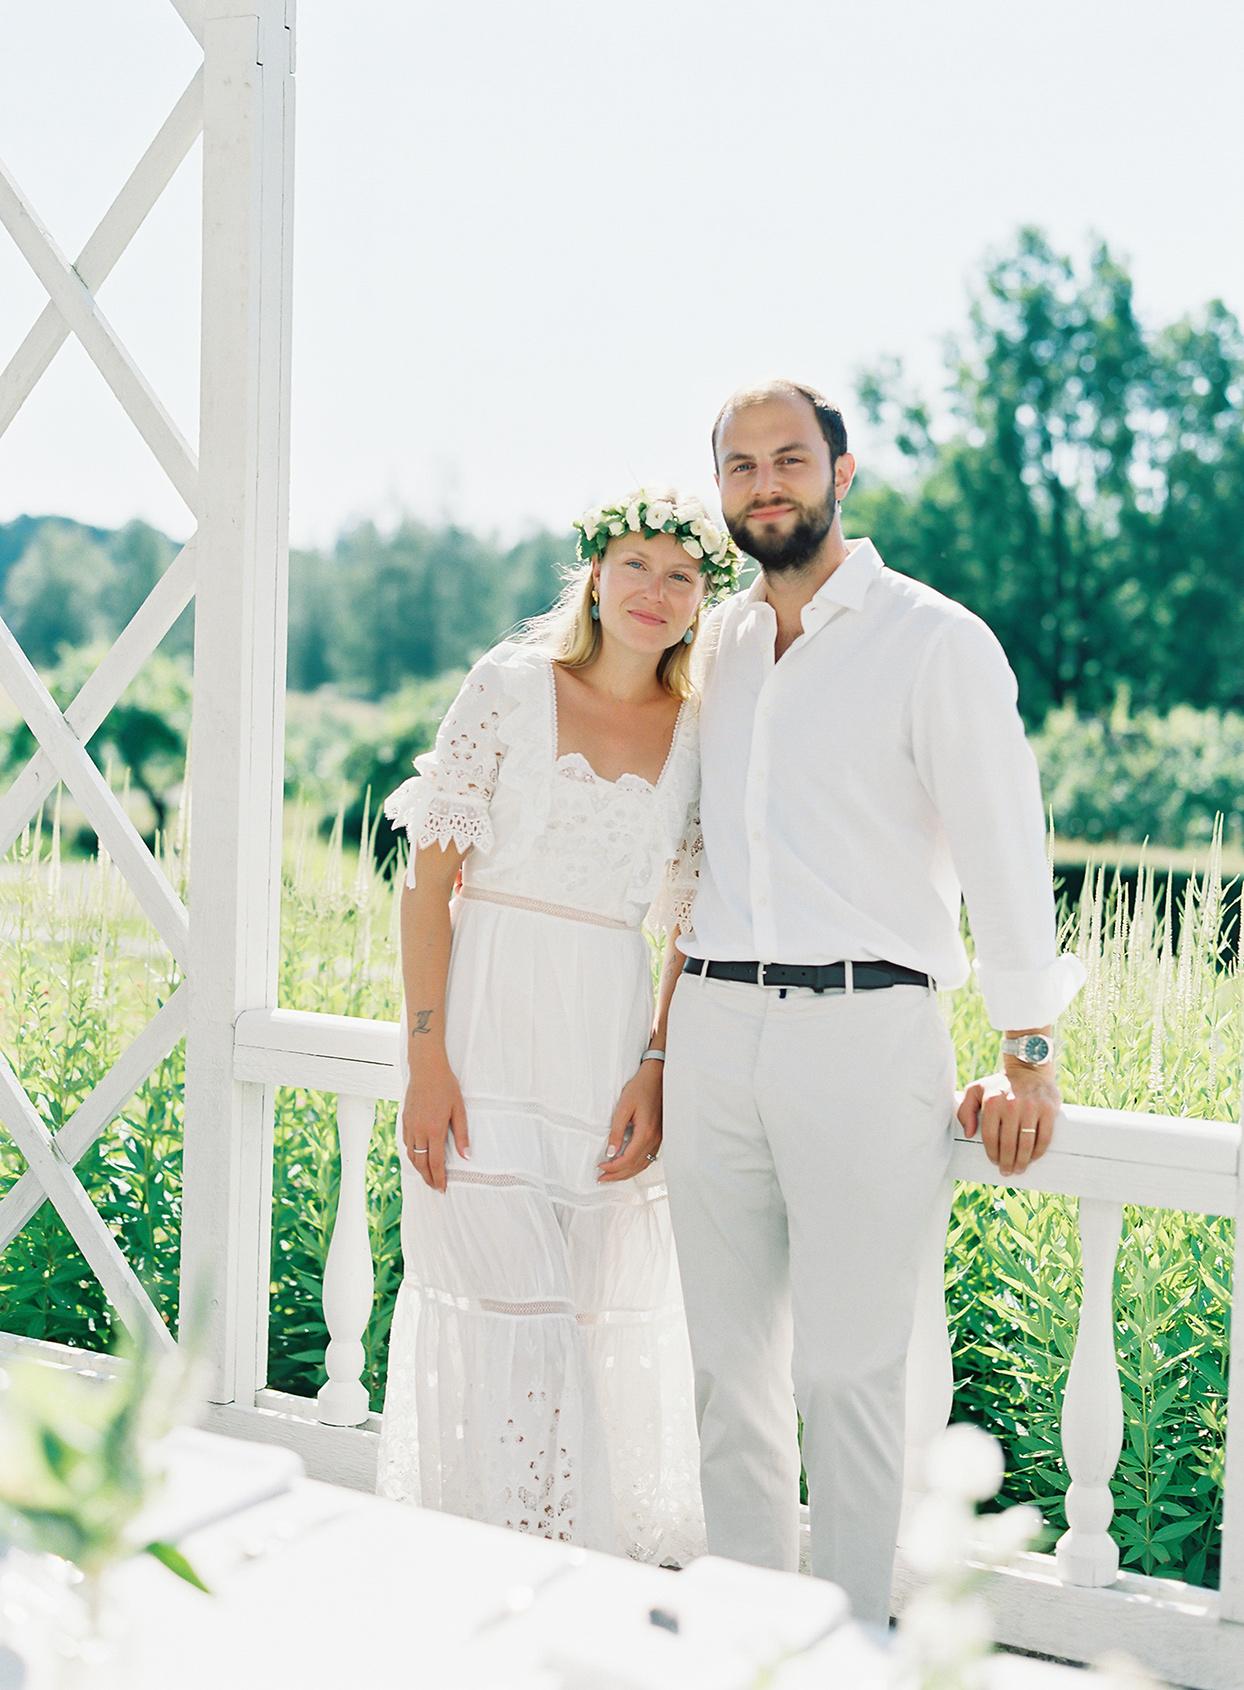 laura alexander wedding couple in white at brunch